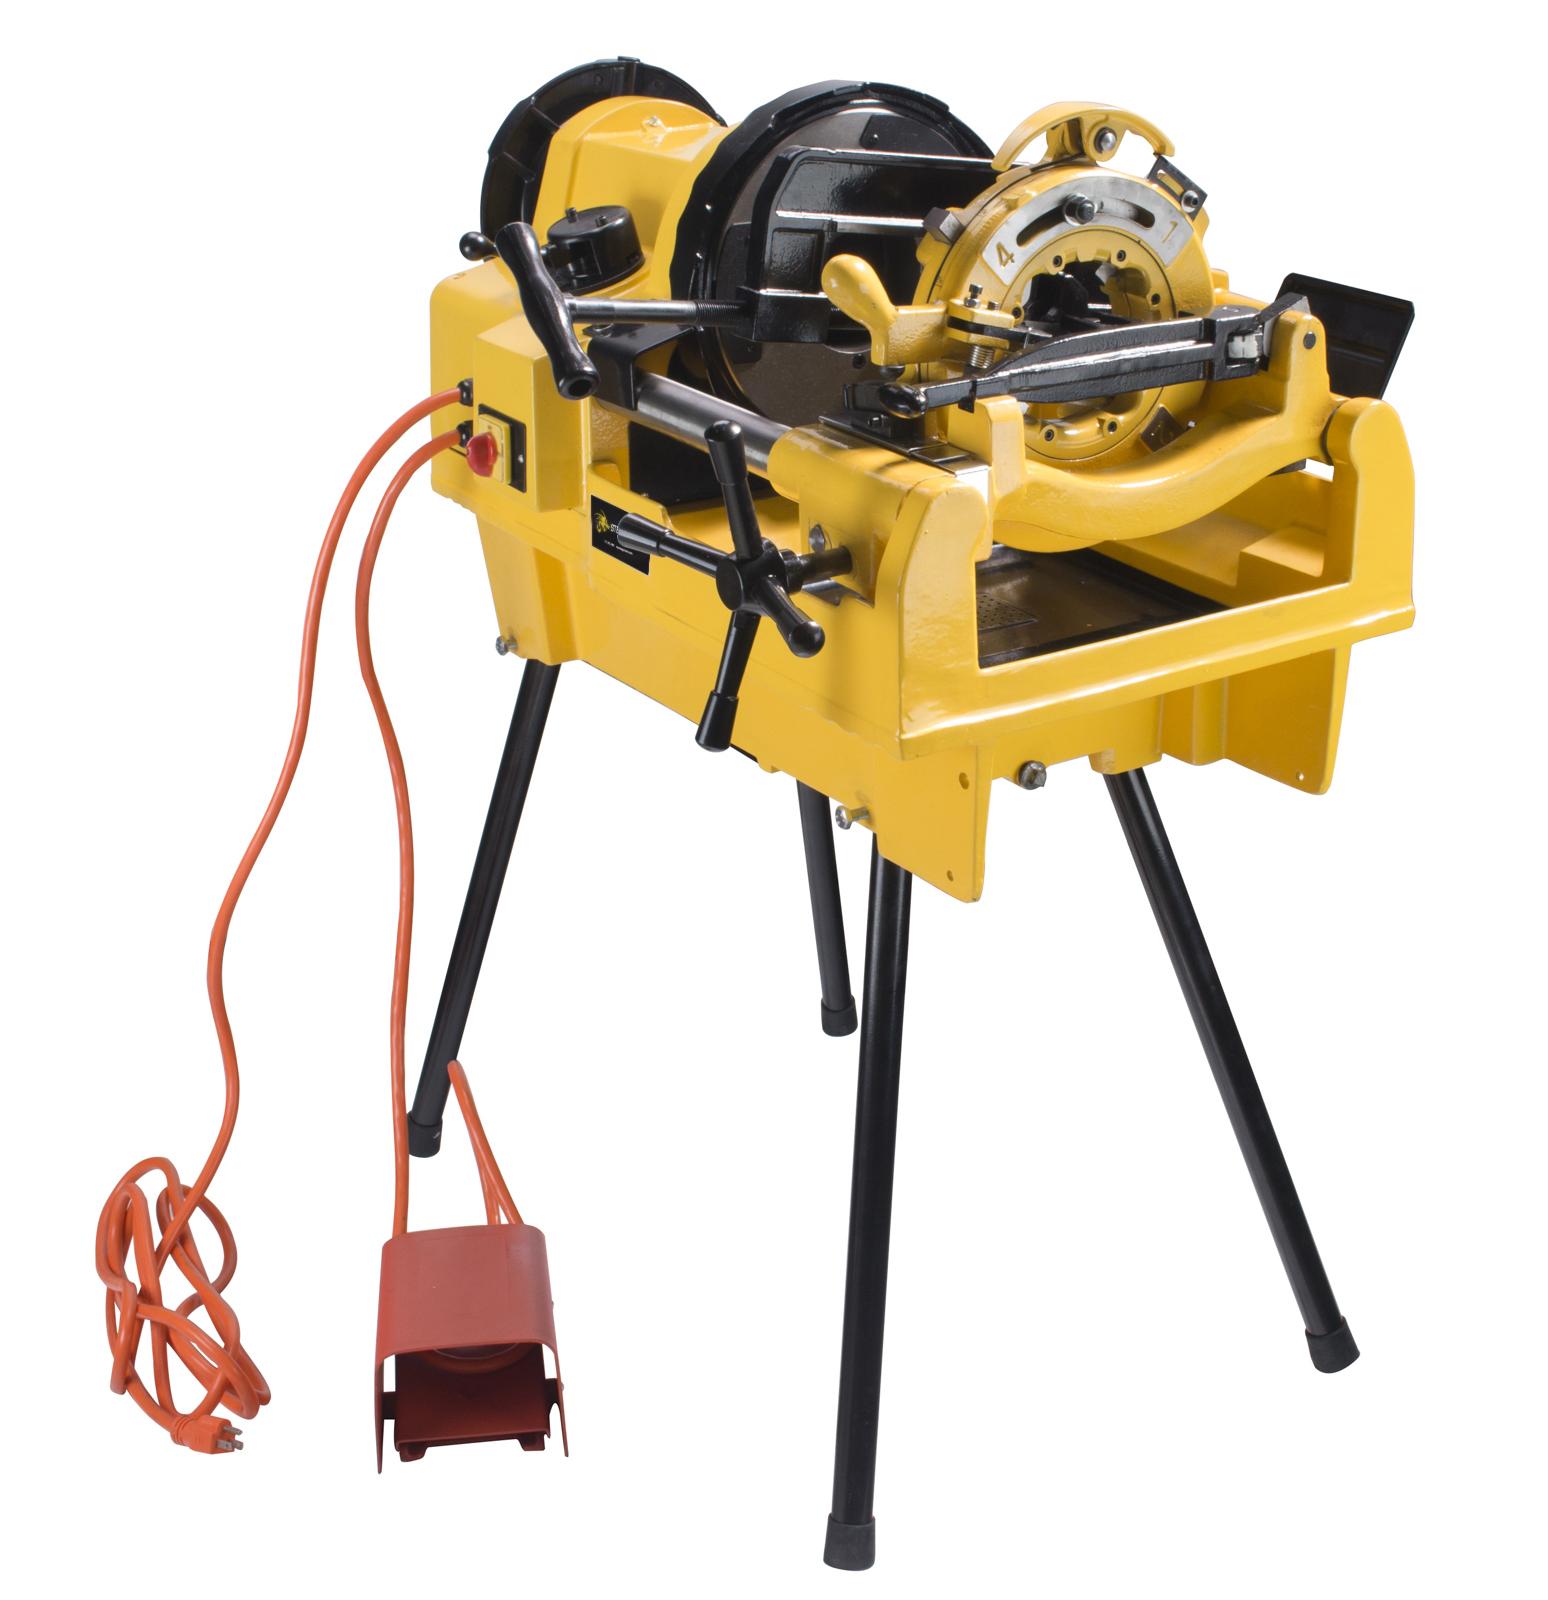 Steel Dragon Tools® 1224 Power Pipe Threader Threading Machine fits RIDGID ® 26092 Dies and 711 714 Die Heads